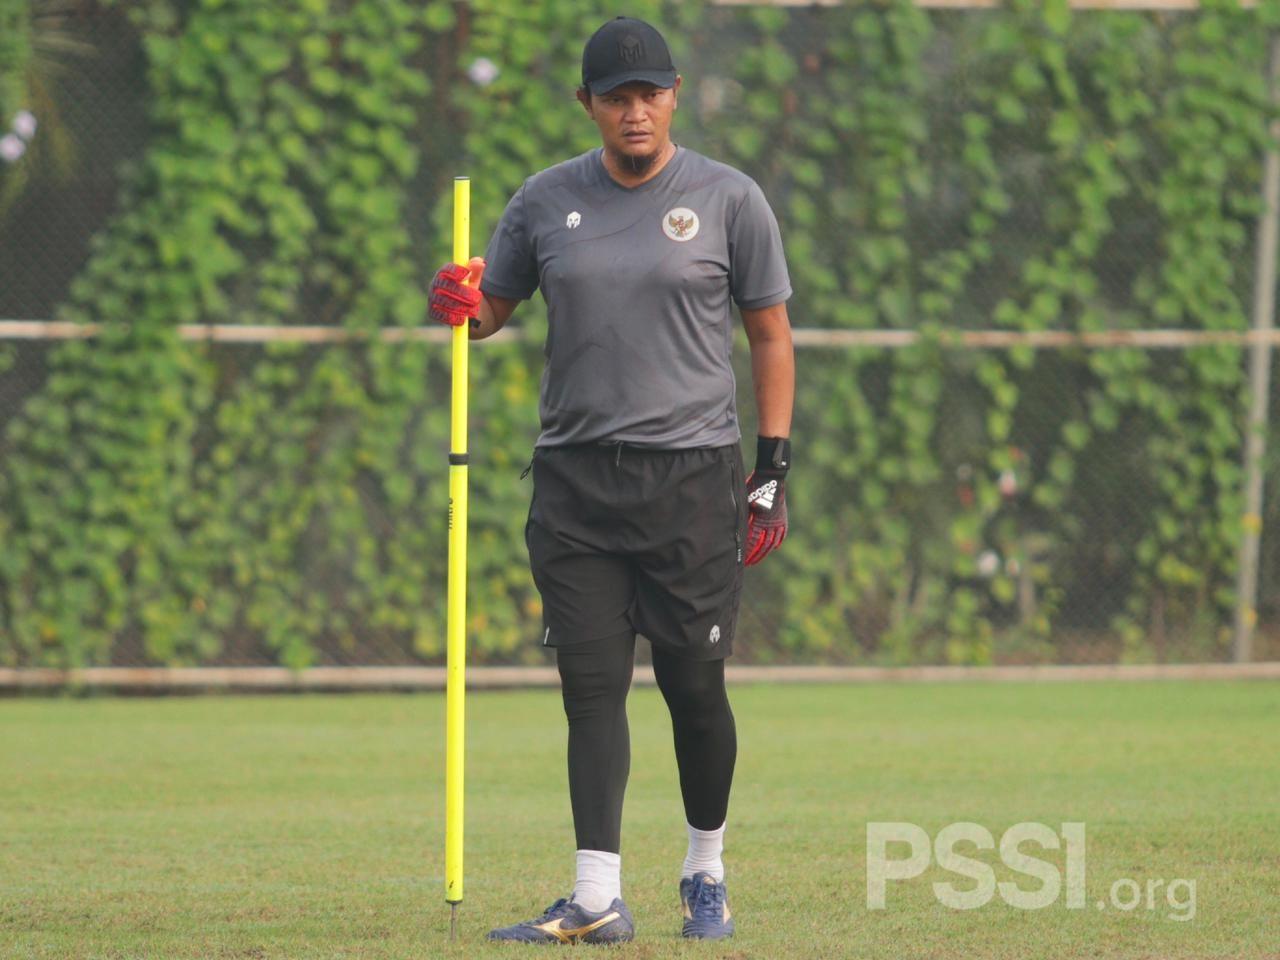 Pelatih kiper timnas putri Indonesia, Kurnia Sandy, cukup puas melihat perkembangan dan kemampuan teknik yang dimiliki oleh empat penjaga gawang skuad Garuda Pertiwi.